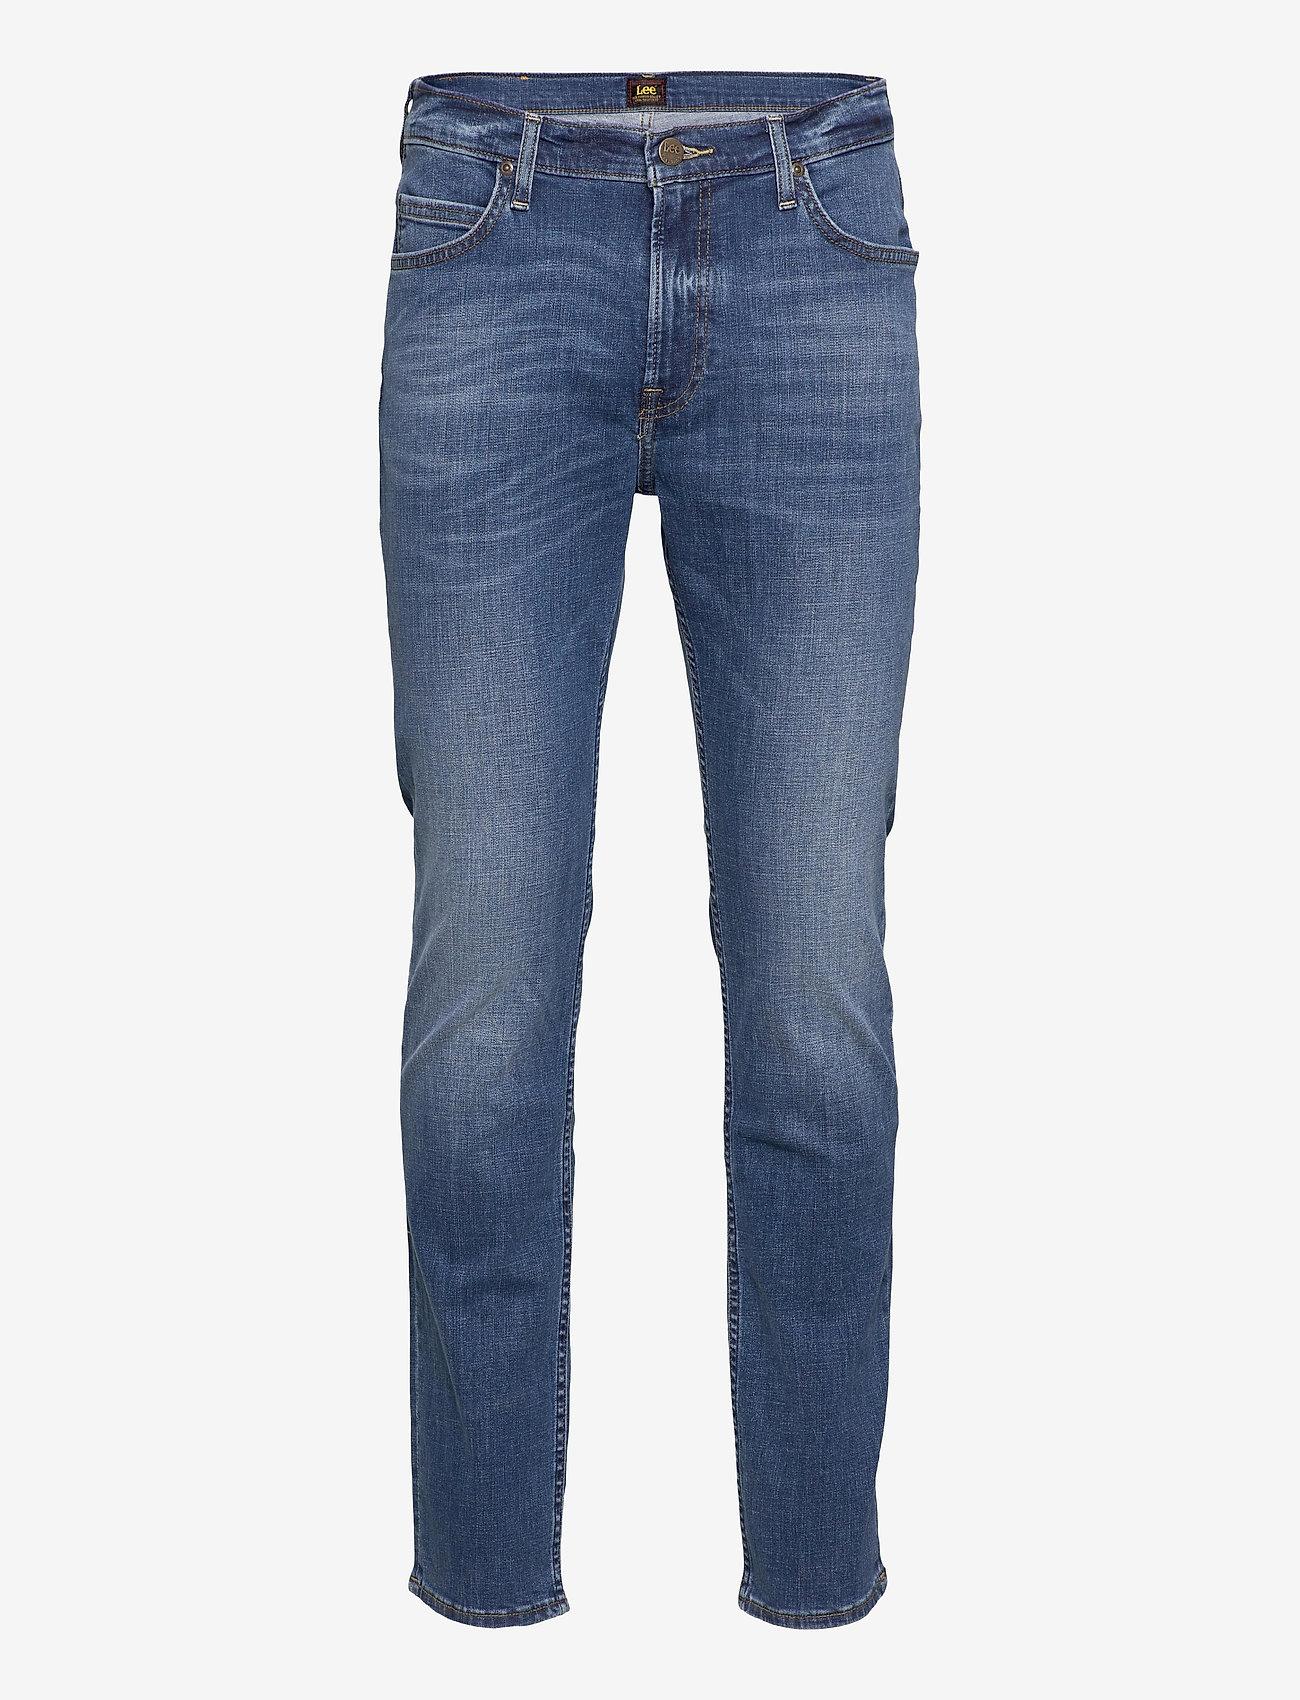 Lee Jeans - RIDER - slim jeans - mid visual cody - 0